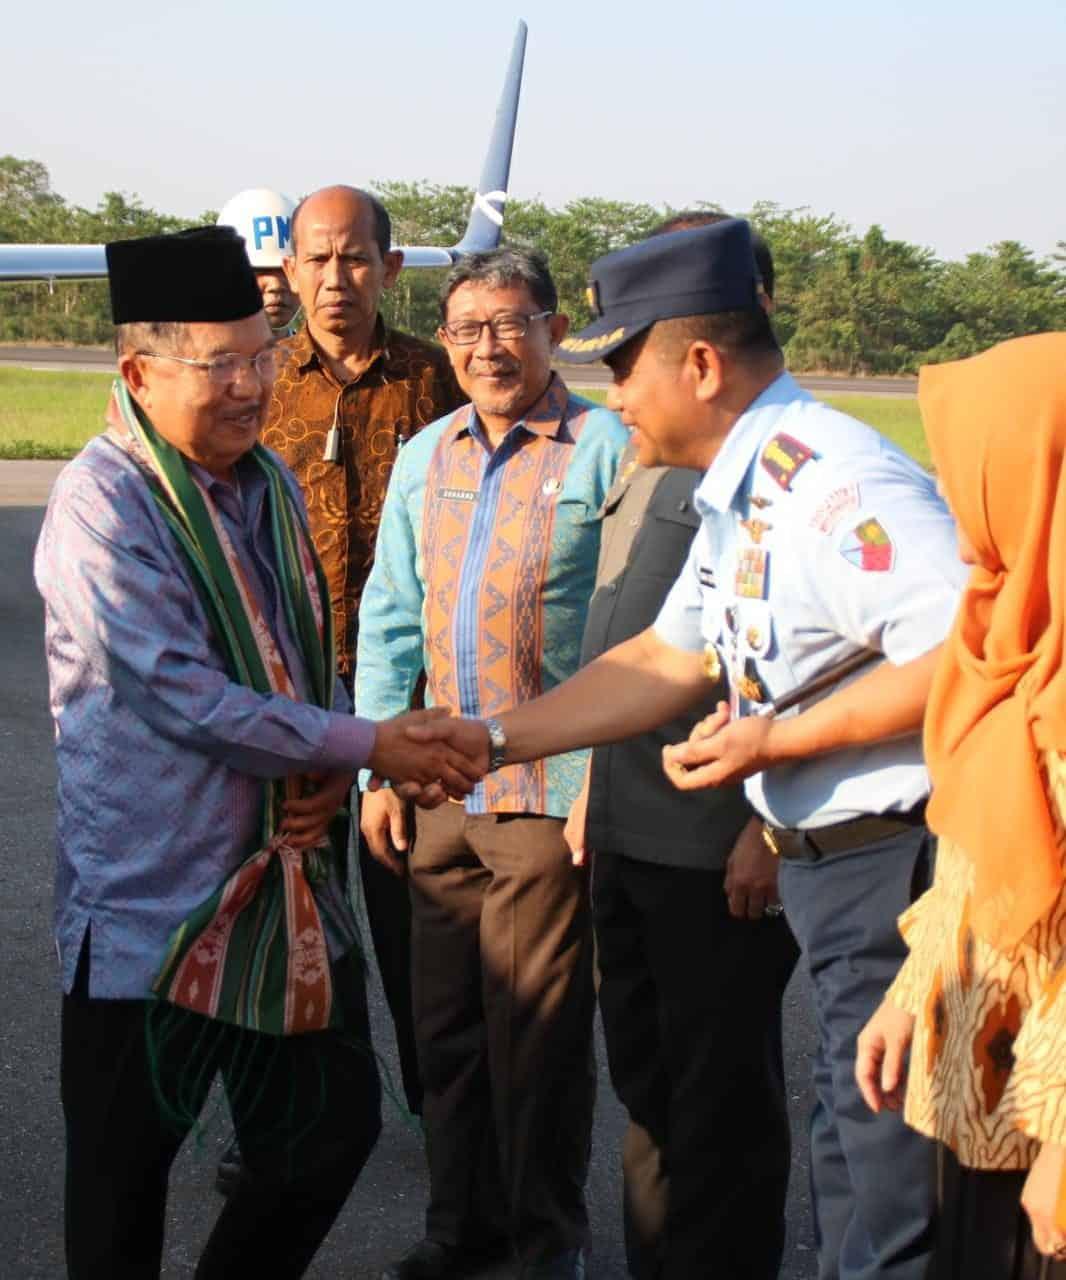 Bapak Dr. Drs. H. Jusuf Kalla mendarat di Lanud dan disambut Danlanud Haluoleo.